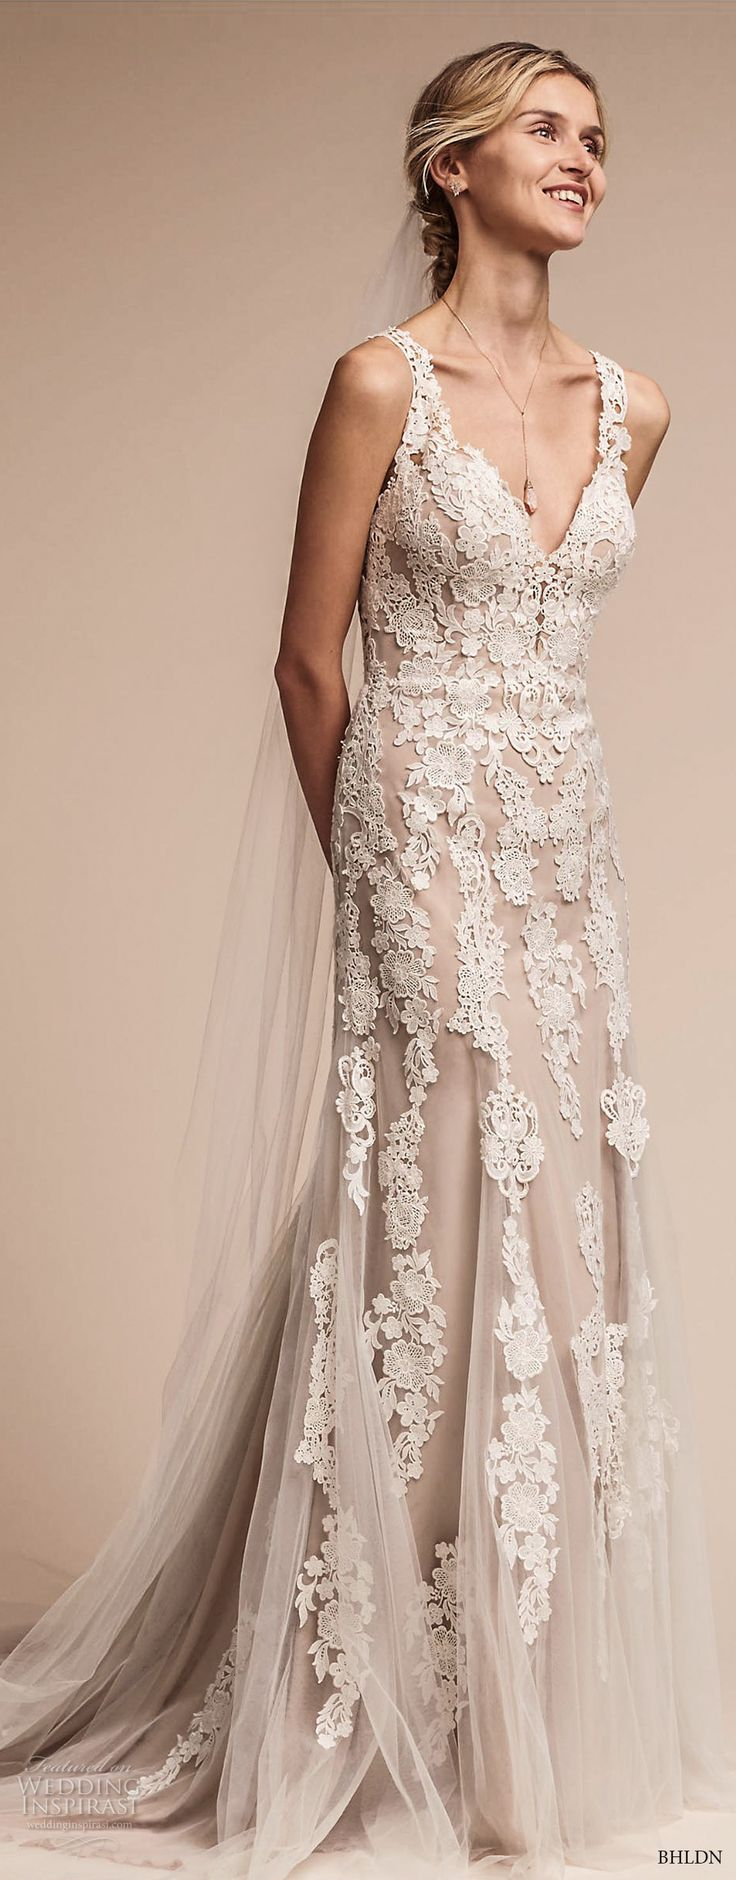 bhldn fall 2017  americana bridal sleeveless embroidered strap heavily embellished bodice elegant romantic sheath a  line wedding dress lace back short train (monarch) fv  -- BHLDN Freshest Fall 2017 Wedding Looks